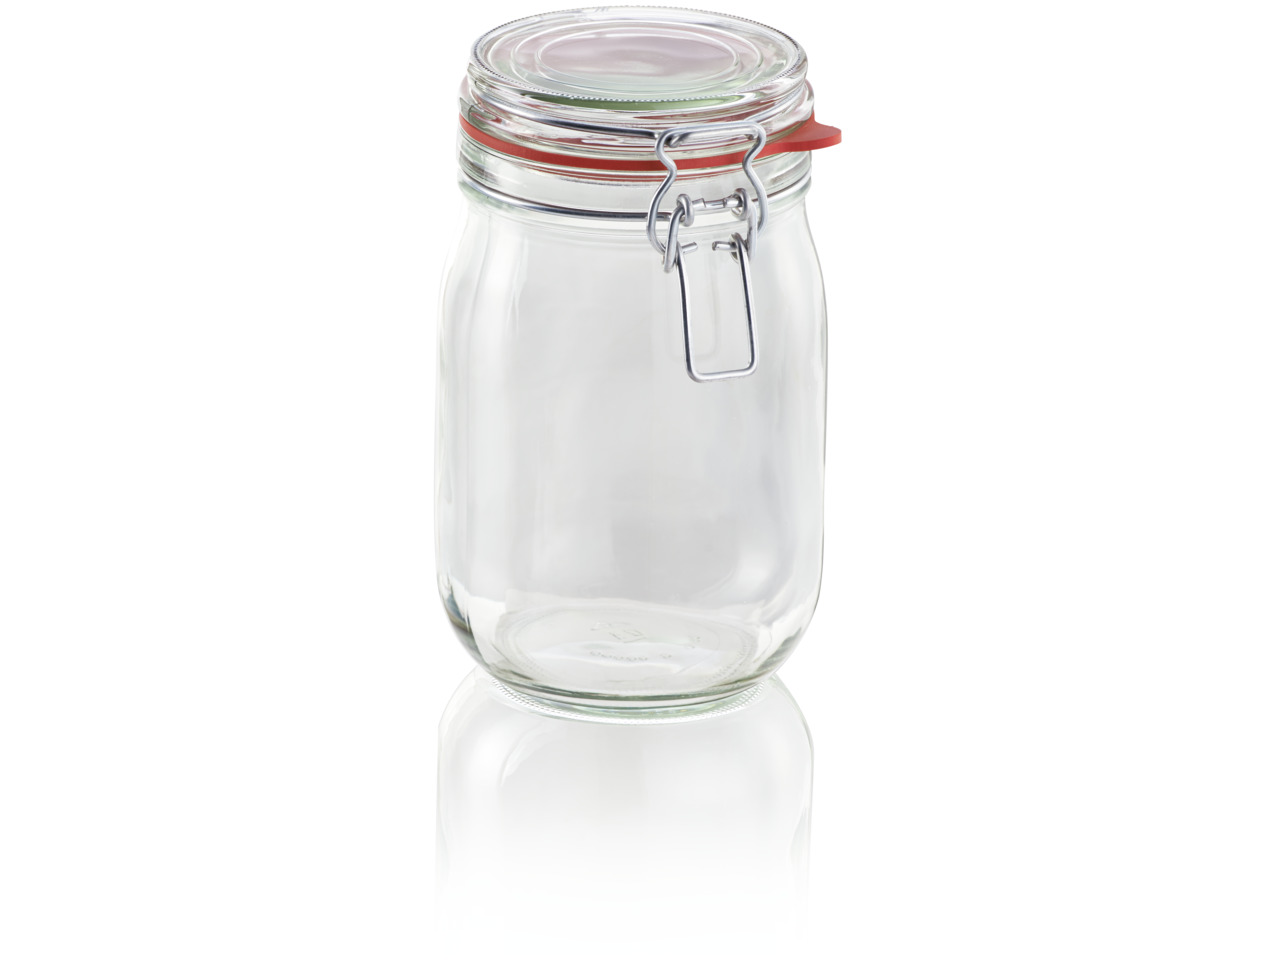 LEIFHEIT 3191 Clip top jar 255 ml